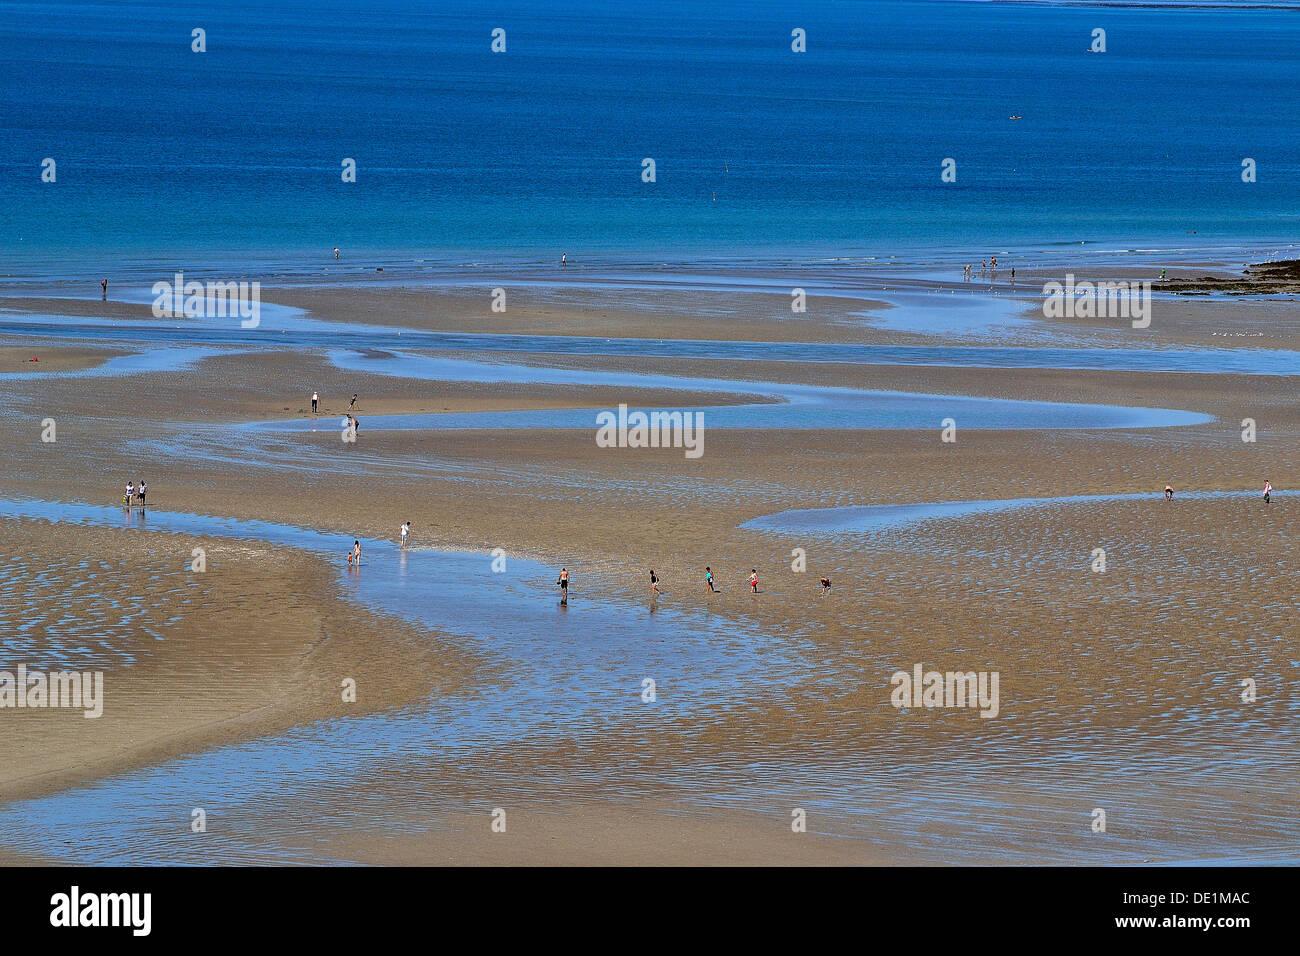 "Marea baja frente a la playa de ""Plat Gousset, Granville (Baja Normandía, Francia). Foto de stock"